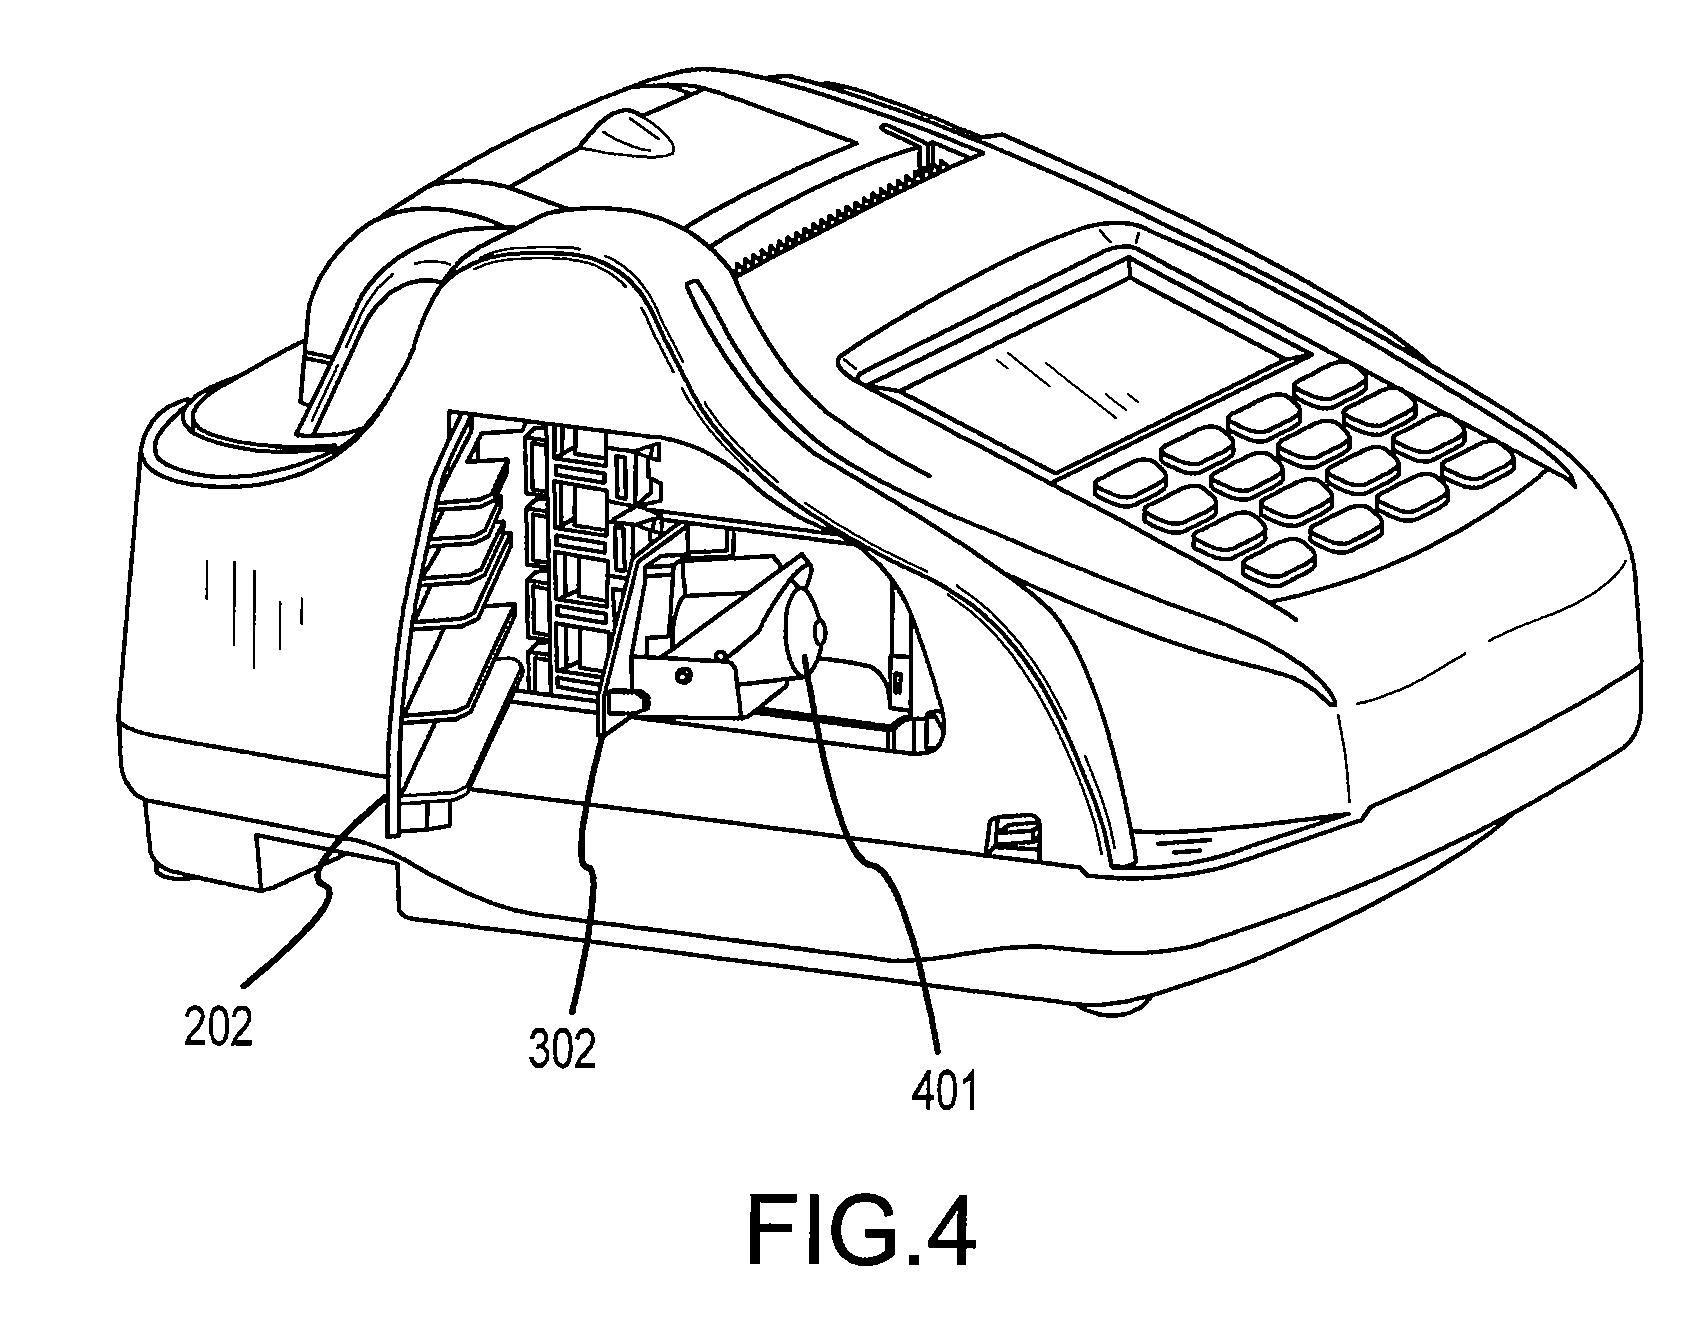 rj11 wiring color code diagram